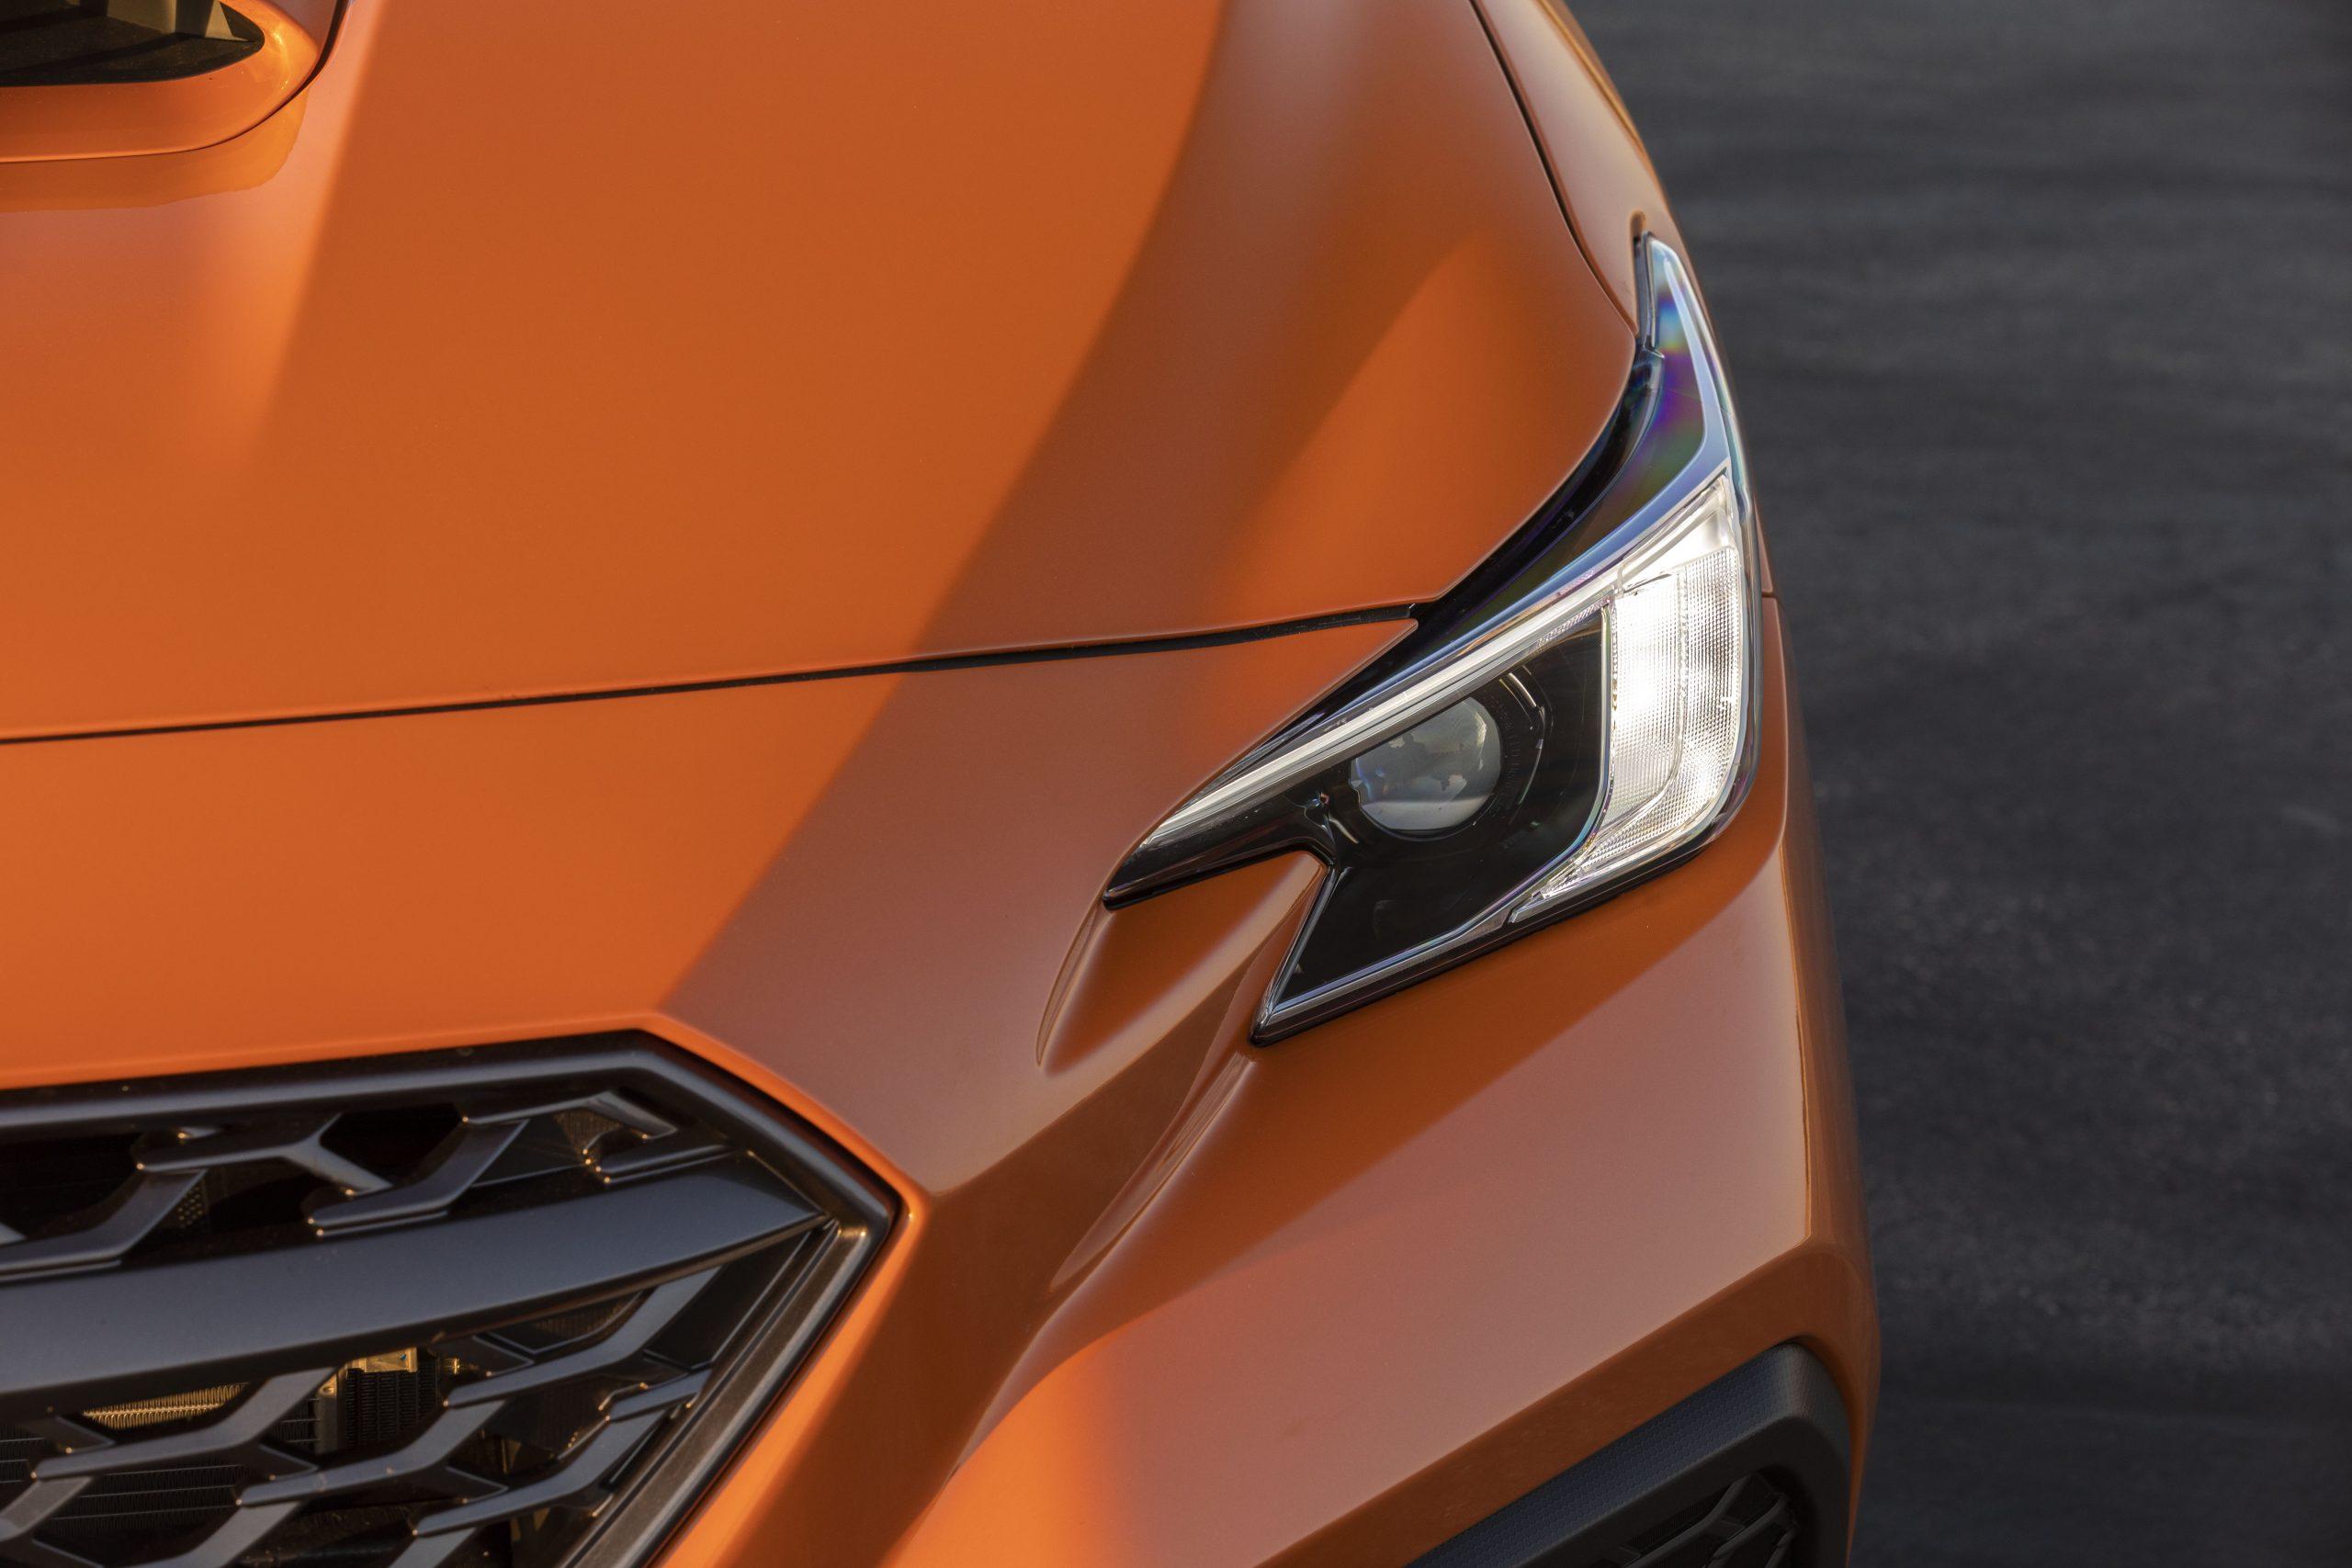 2022 Subaru WRX headlight